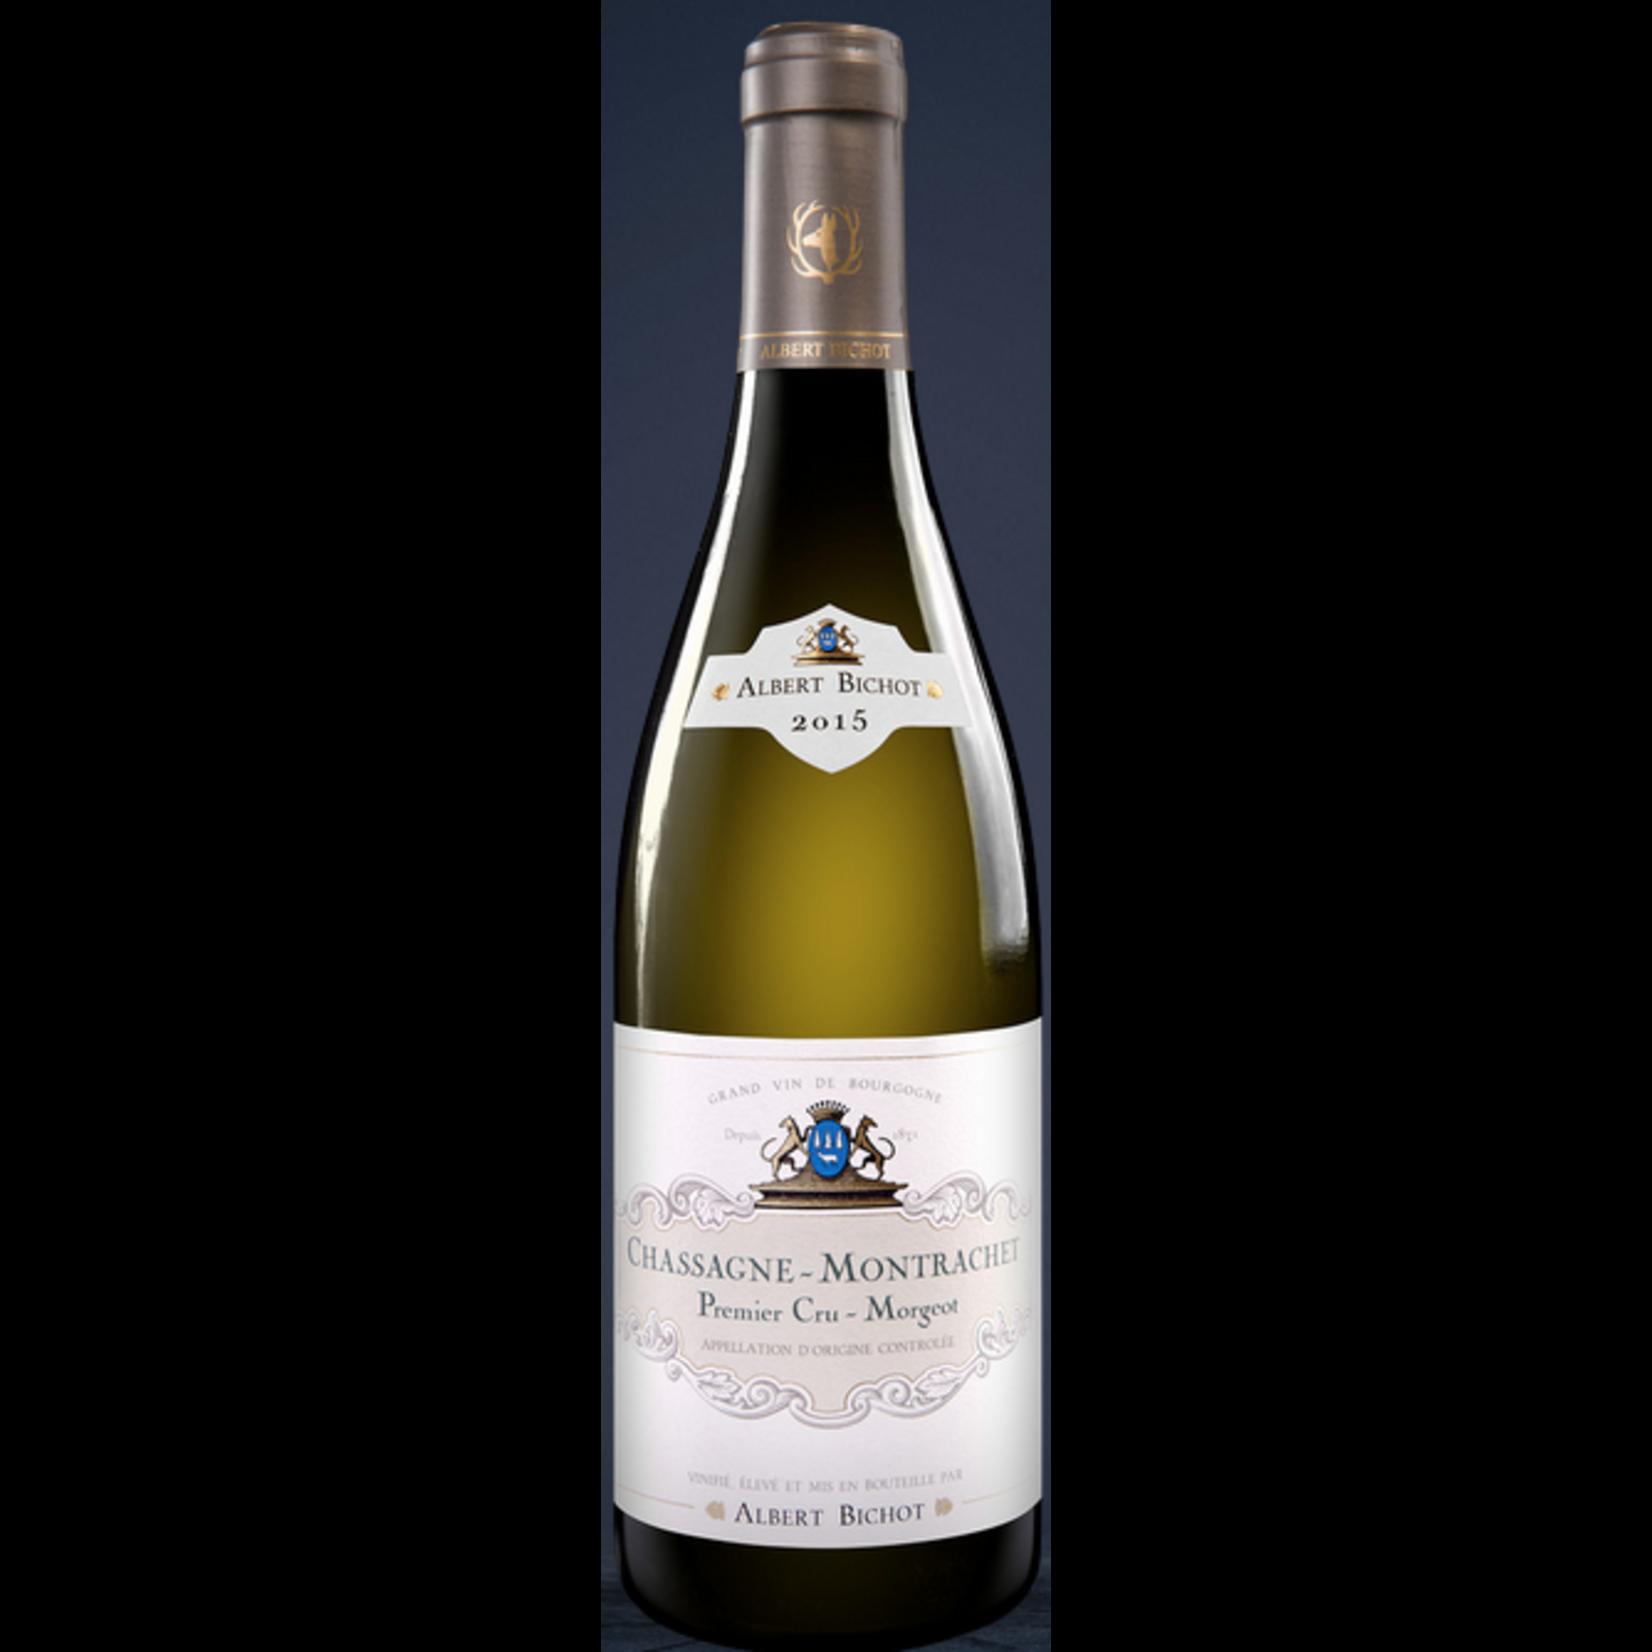 Albert Bichot Albert Bichot Chassagne-Montrachet Blanc 2019 Burgundy, France